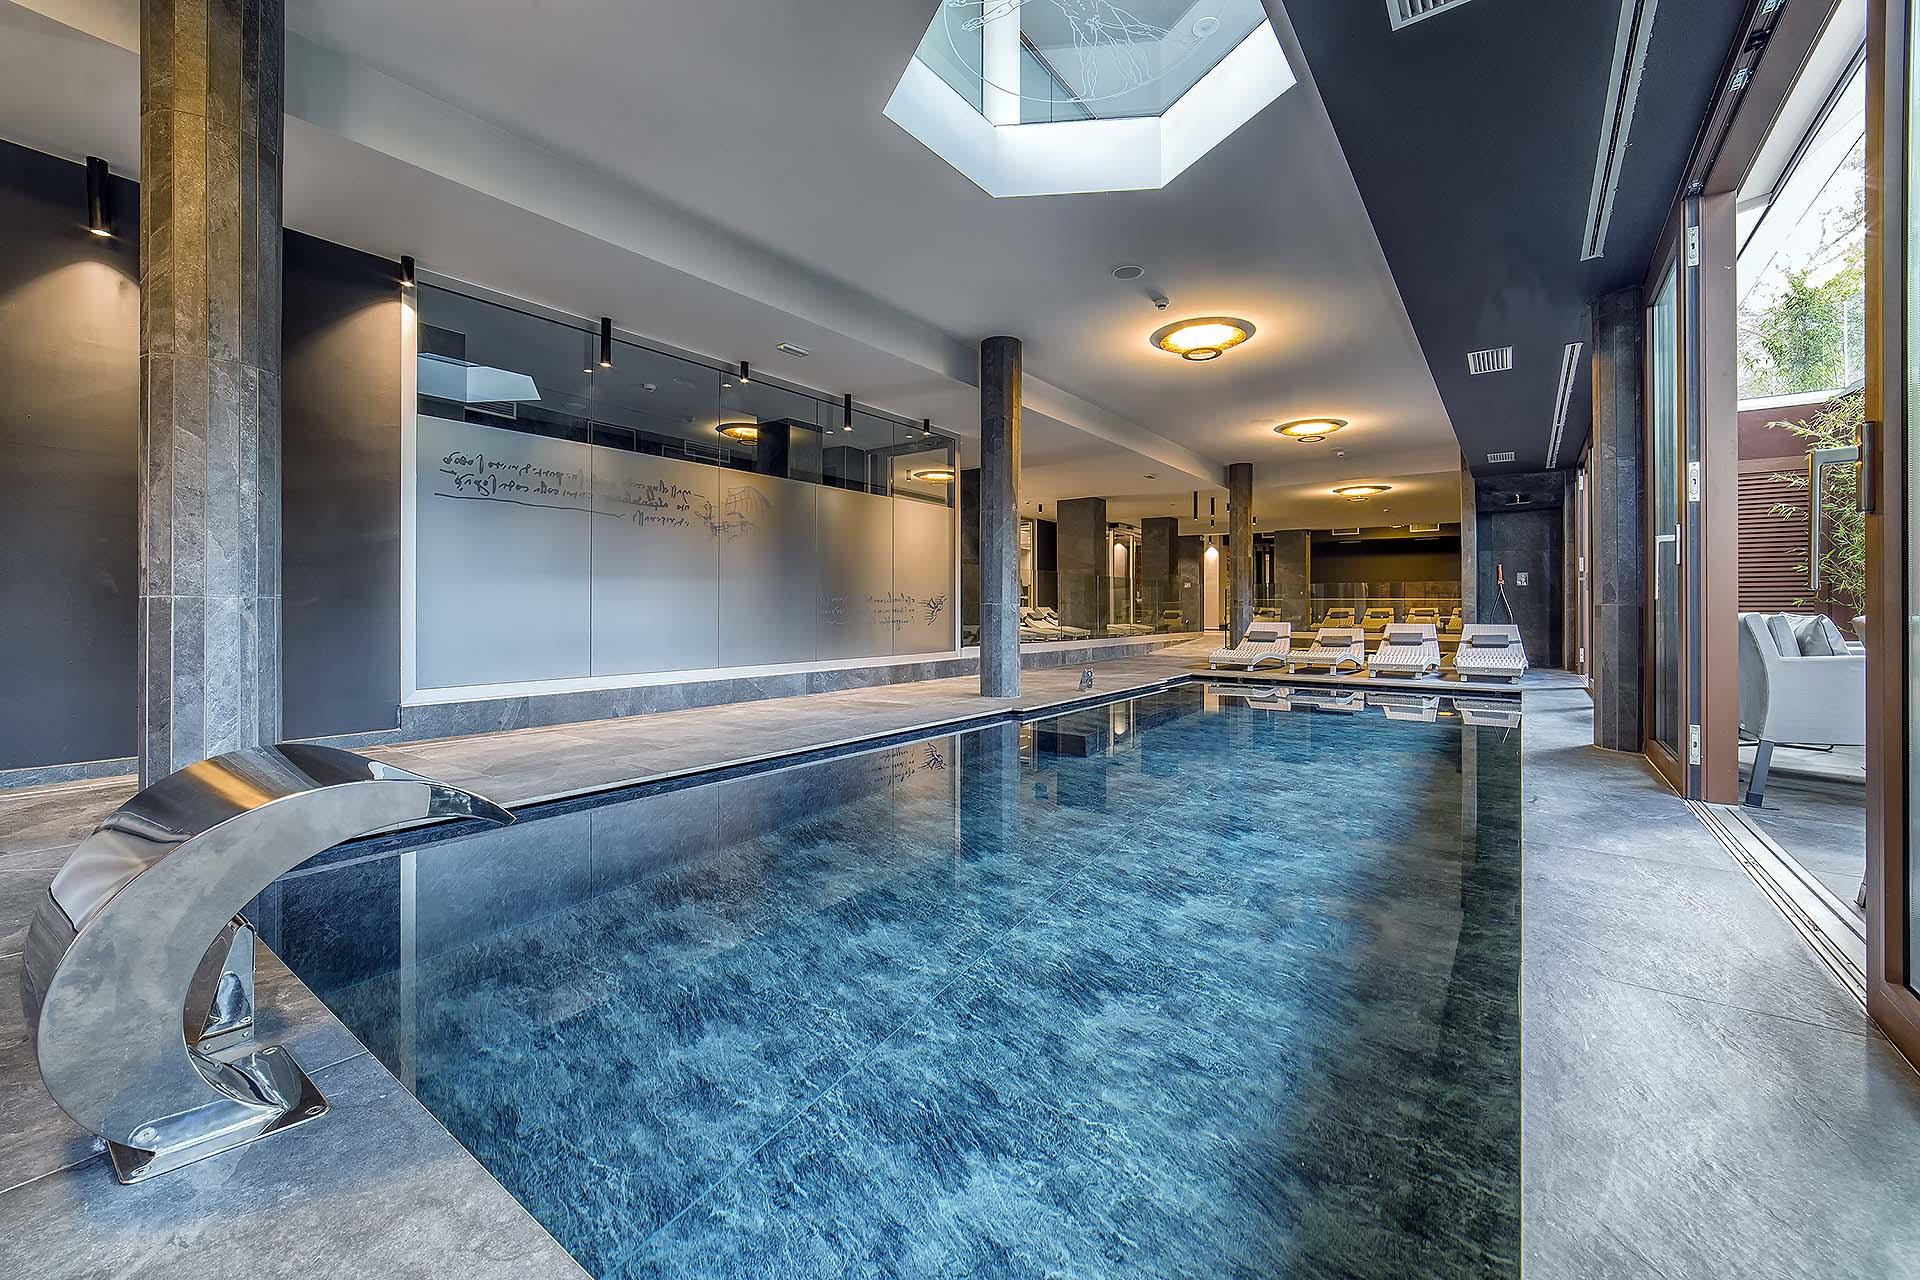 ADULT POOL <br> HOTEL LEONARDO DA VINCI - BIBIONE (VE)